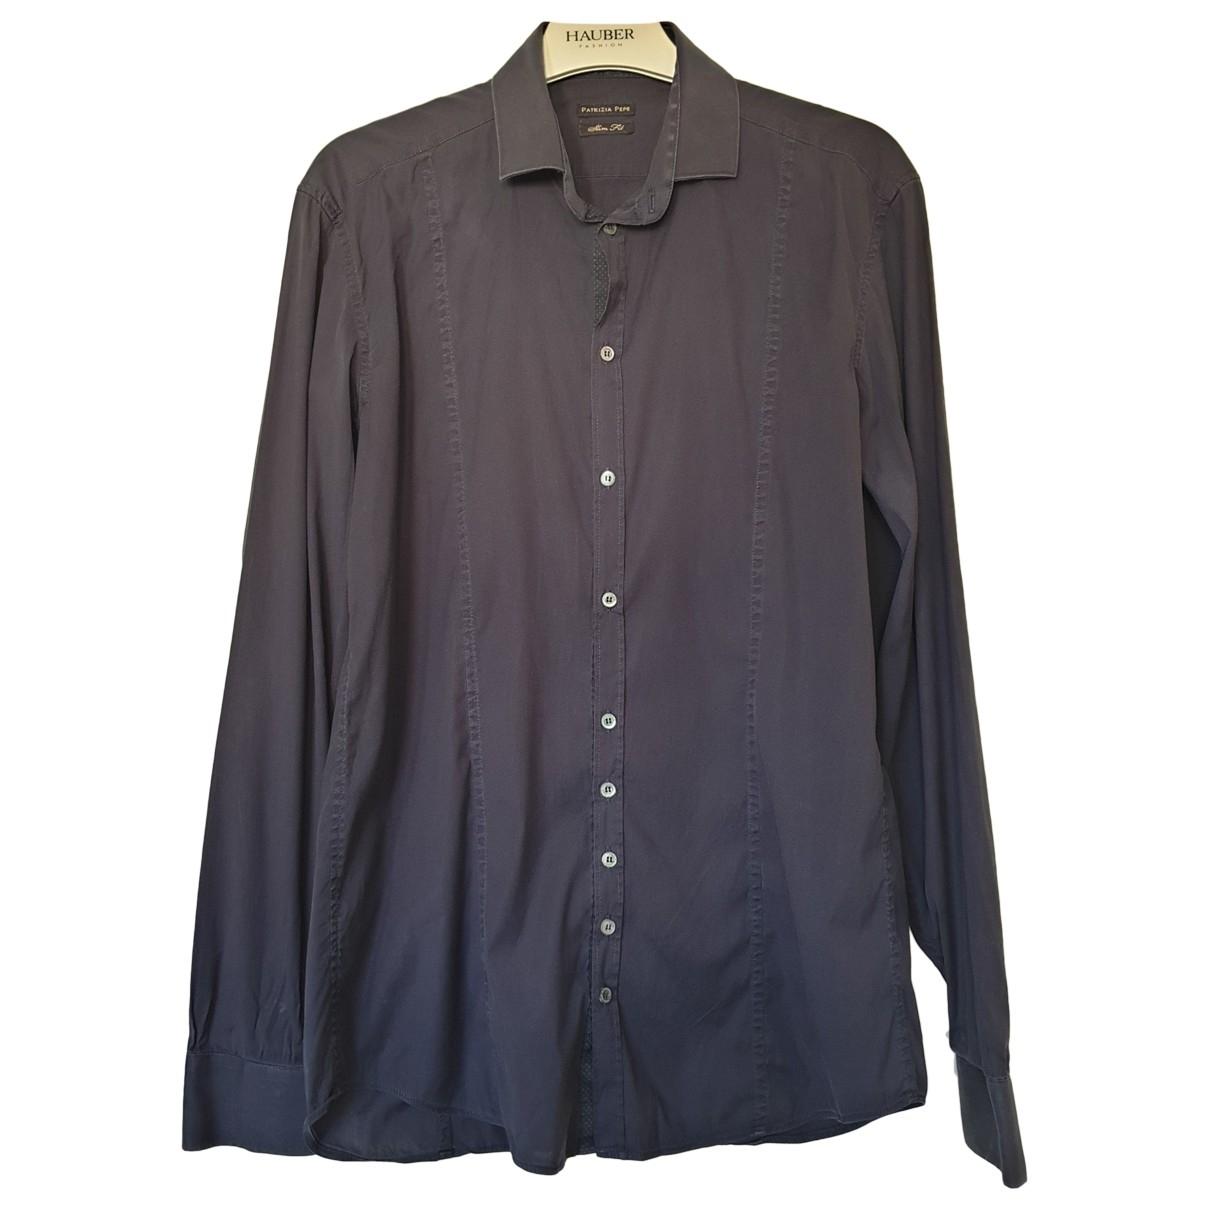 Patrizia Pepe \N Anthracite Cotton Shirts for Men S International